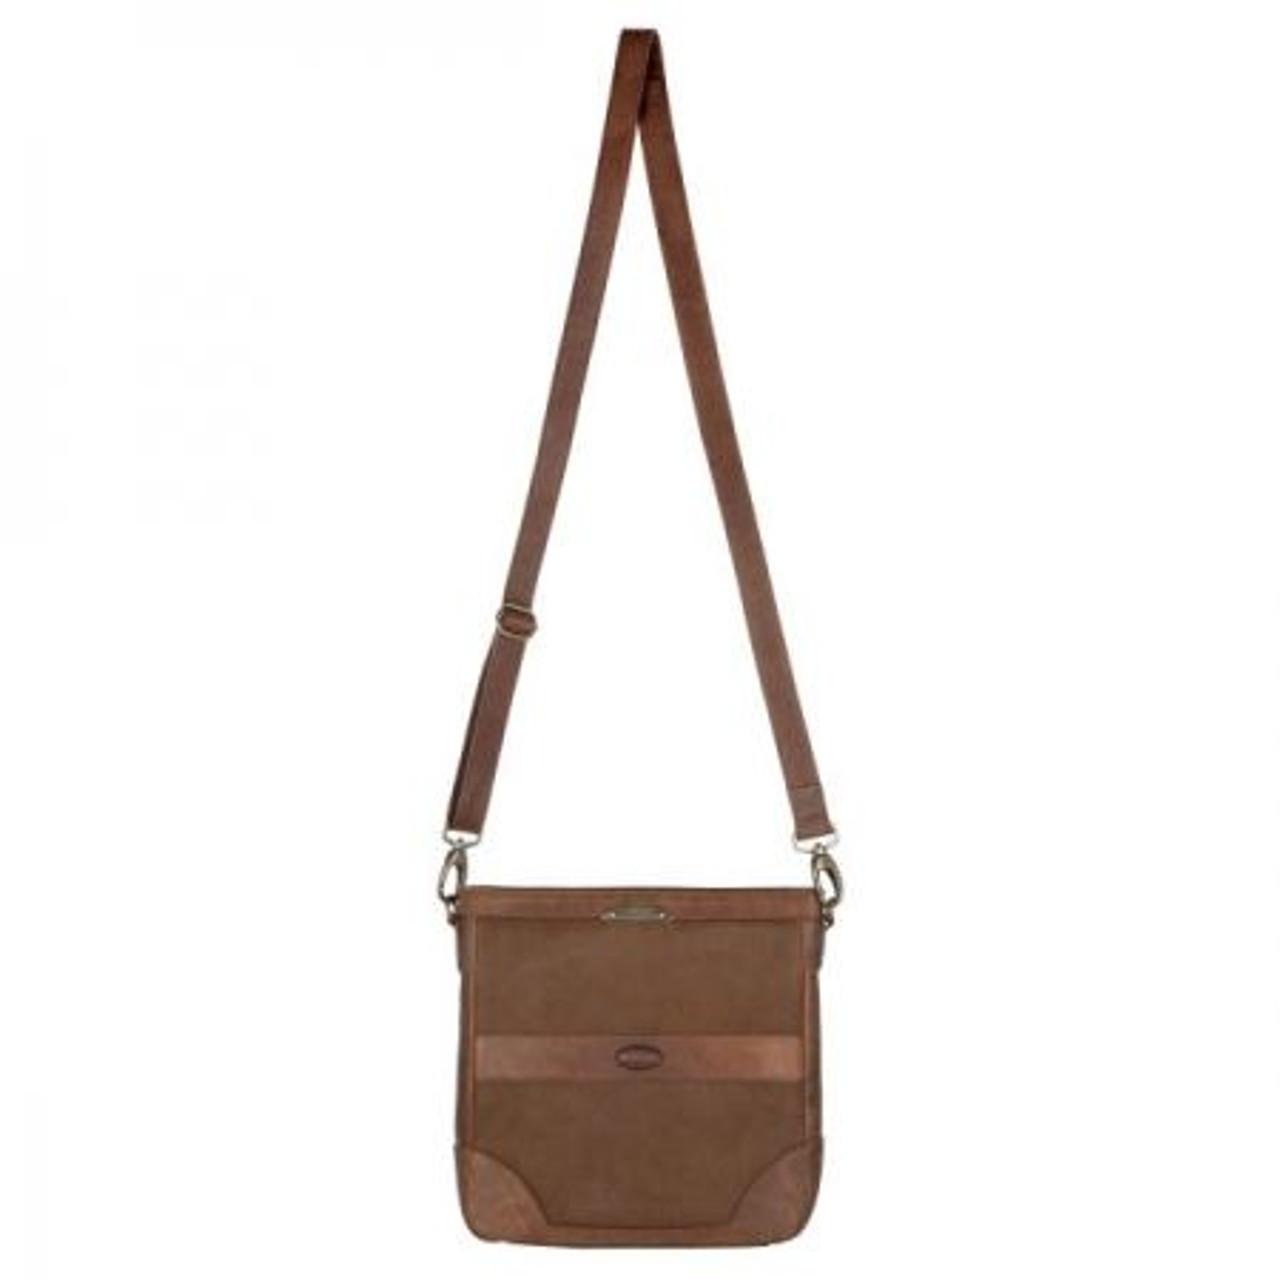 Dubarry Ardmore Messenger Bag in Walnut